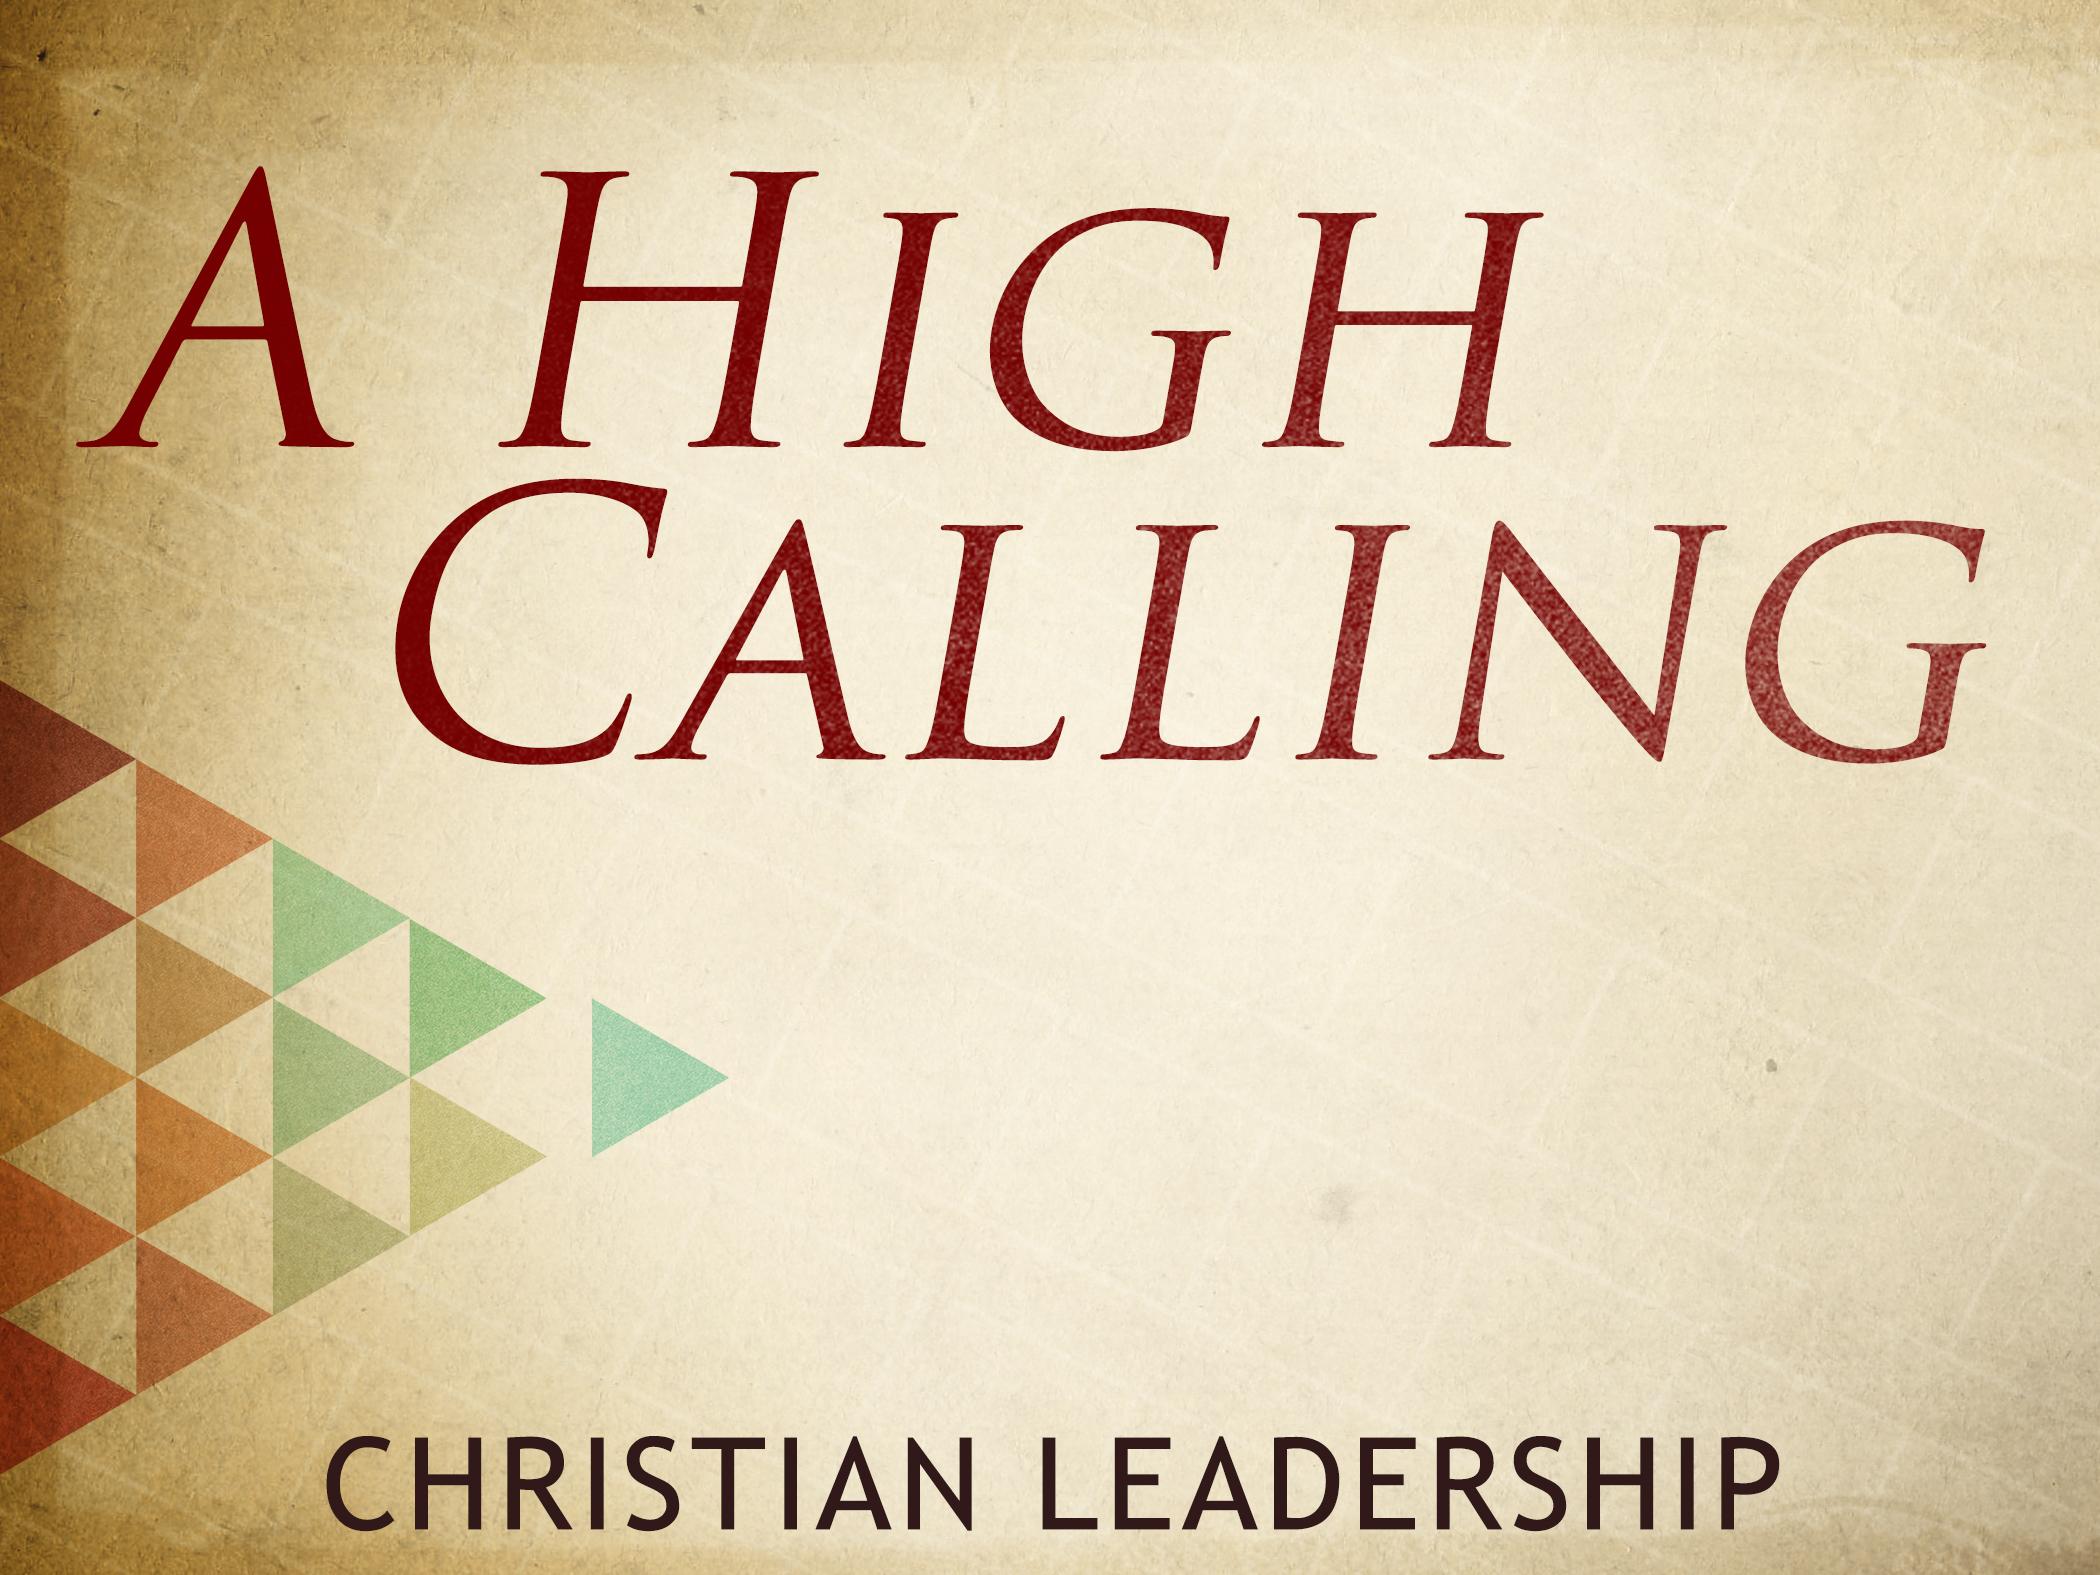 a high calling - christian leadership - TITLE.jpg